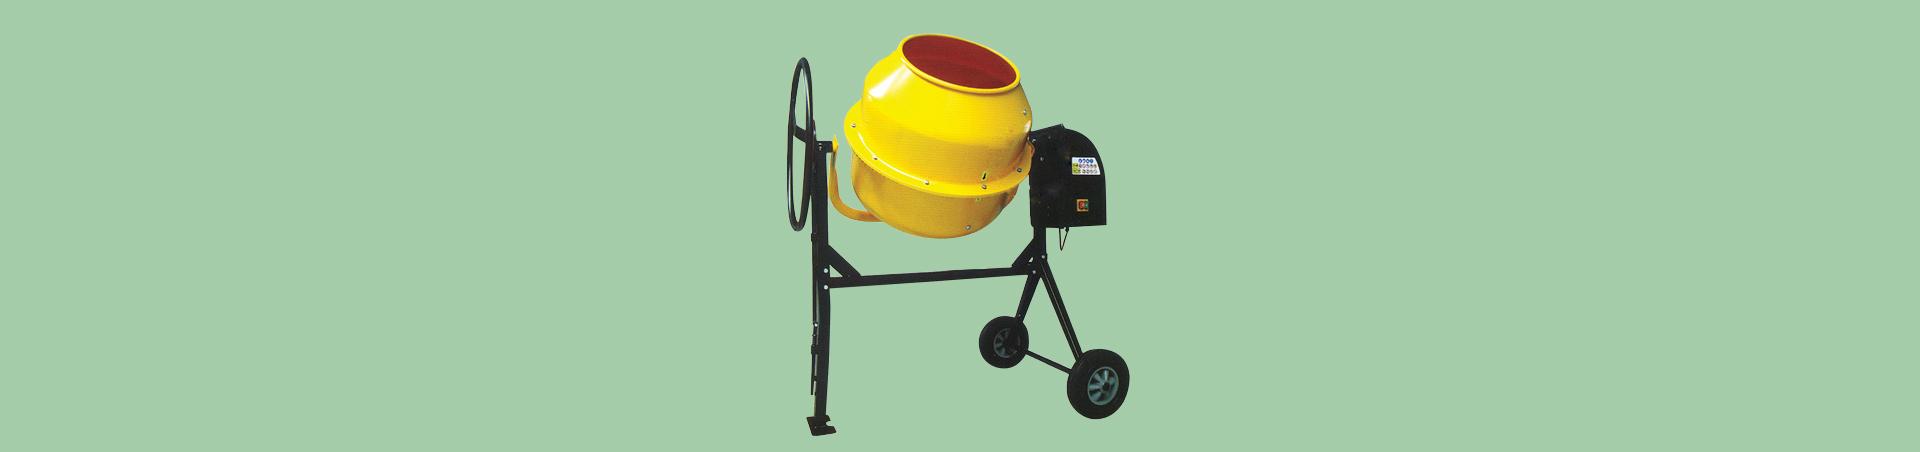 BPA Bonomini  Motocarriole Carriole per edilizia Carriole per giardinaggio